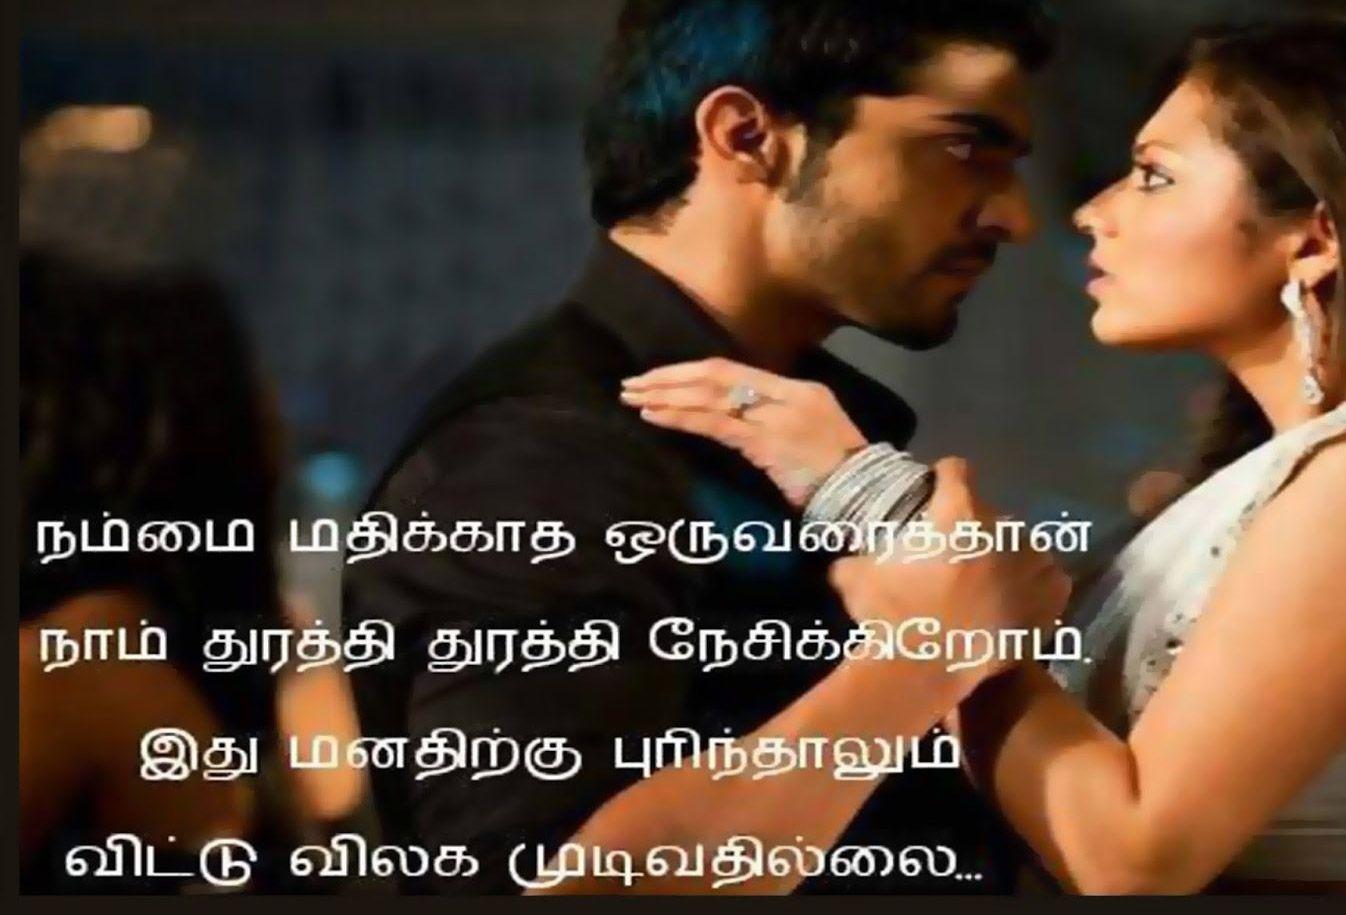 Tamil Love Status Picture Hd Download Love Status Status Wallpaper Photos For Facebook